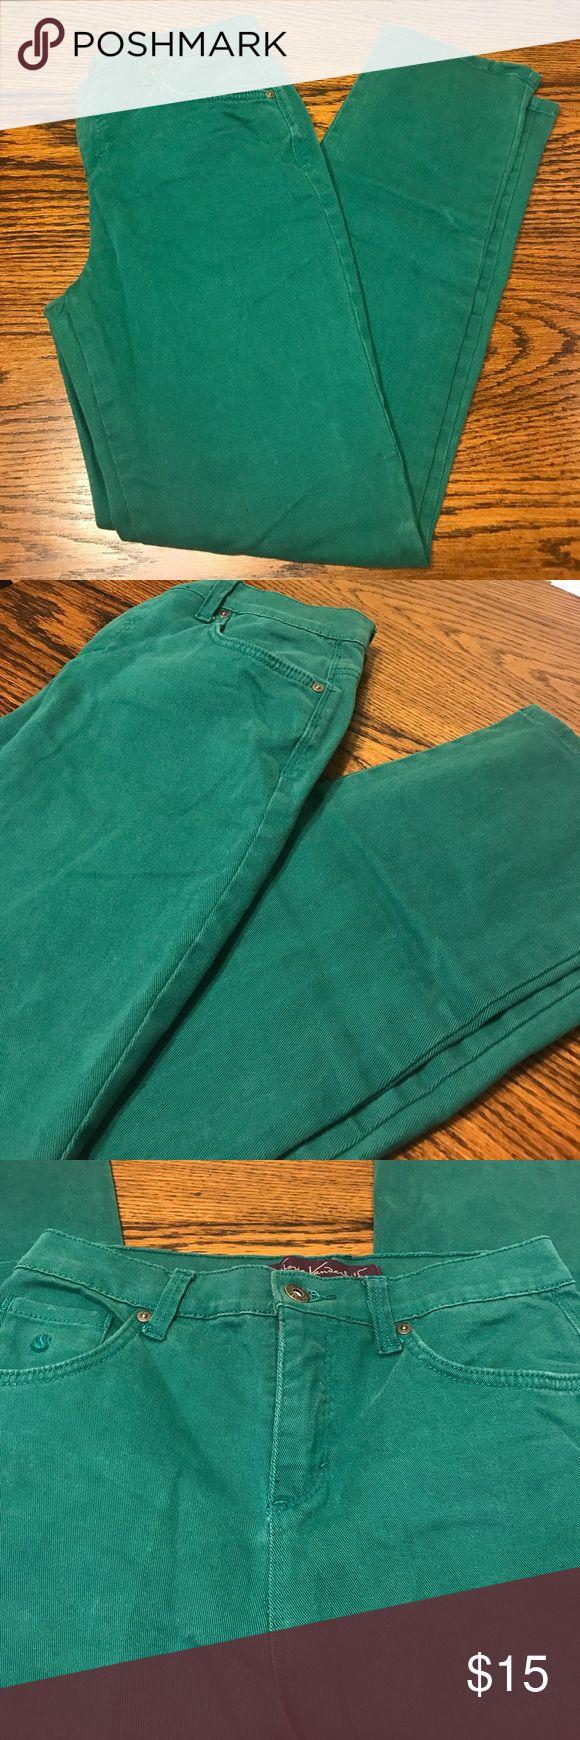 "Gloria Vanderbilt Amanda Teal Jeans Sz 4 Short Gloria Vanderbilt Amanda Teal Jeans Sz 4 Short. Waist 28"" inseam 29"". Like new condition. Very cute and stylish! Gloria Vanderbilt Jeans Straight Leg"